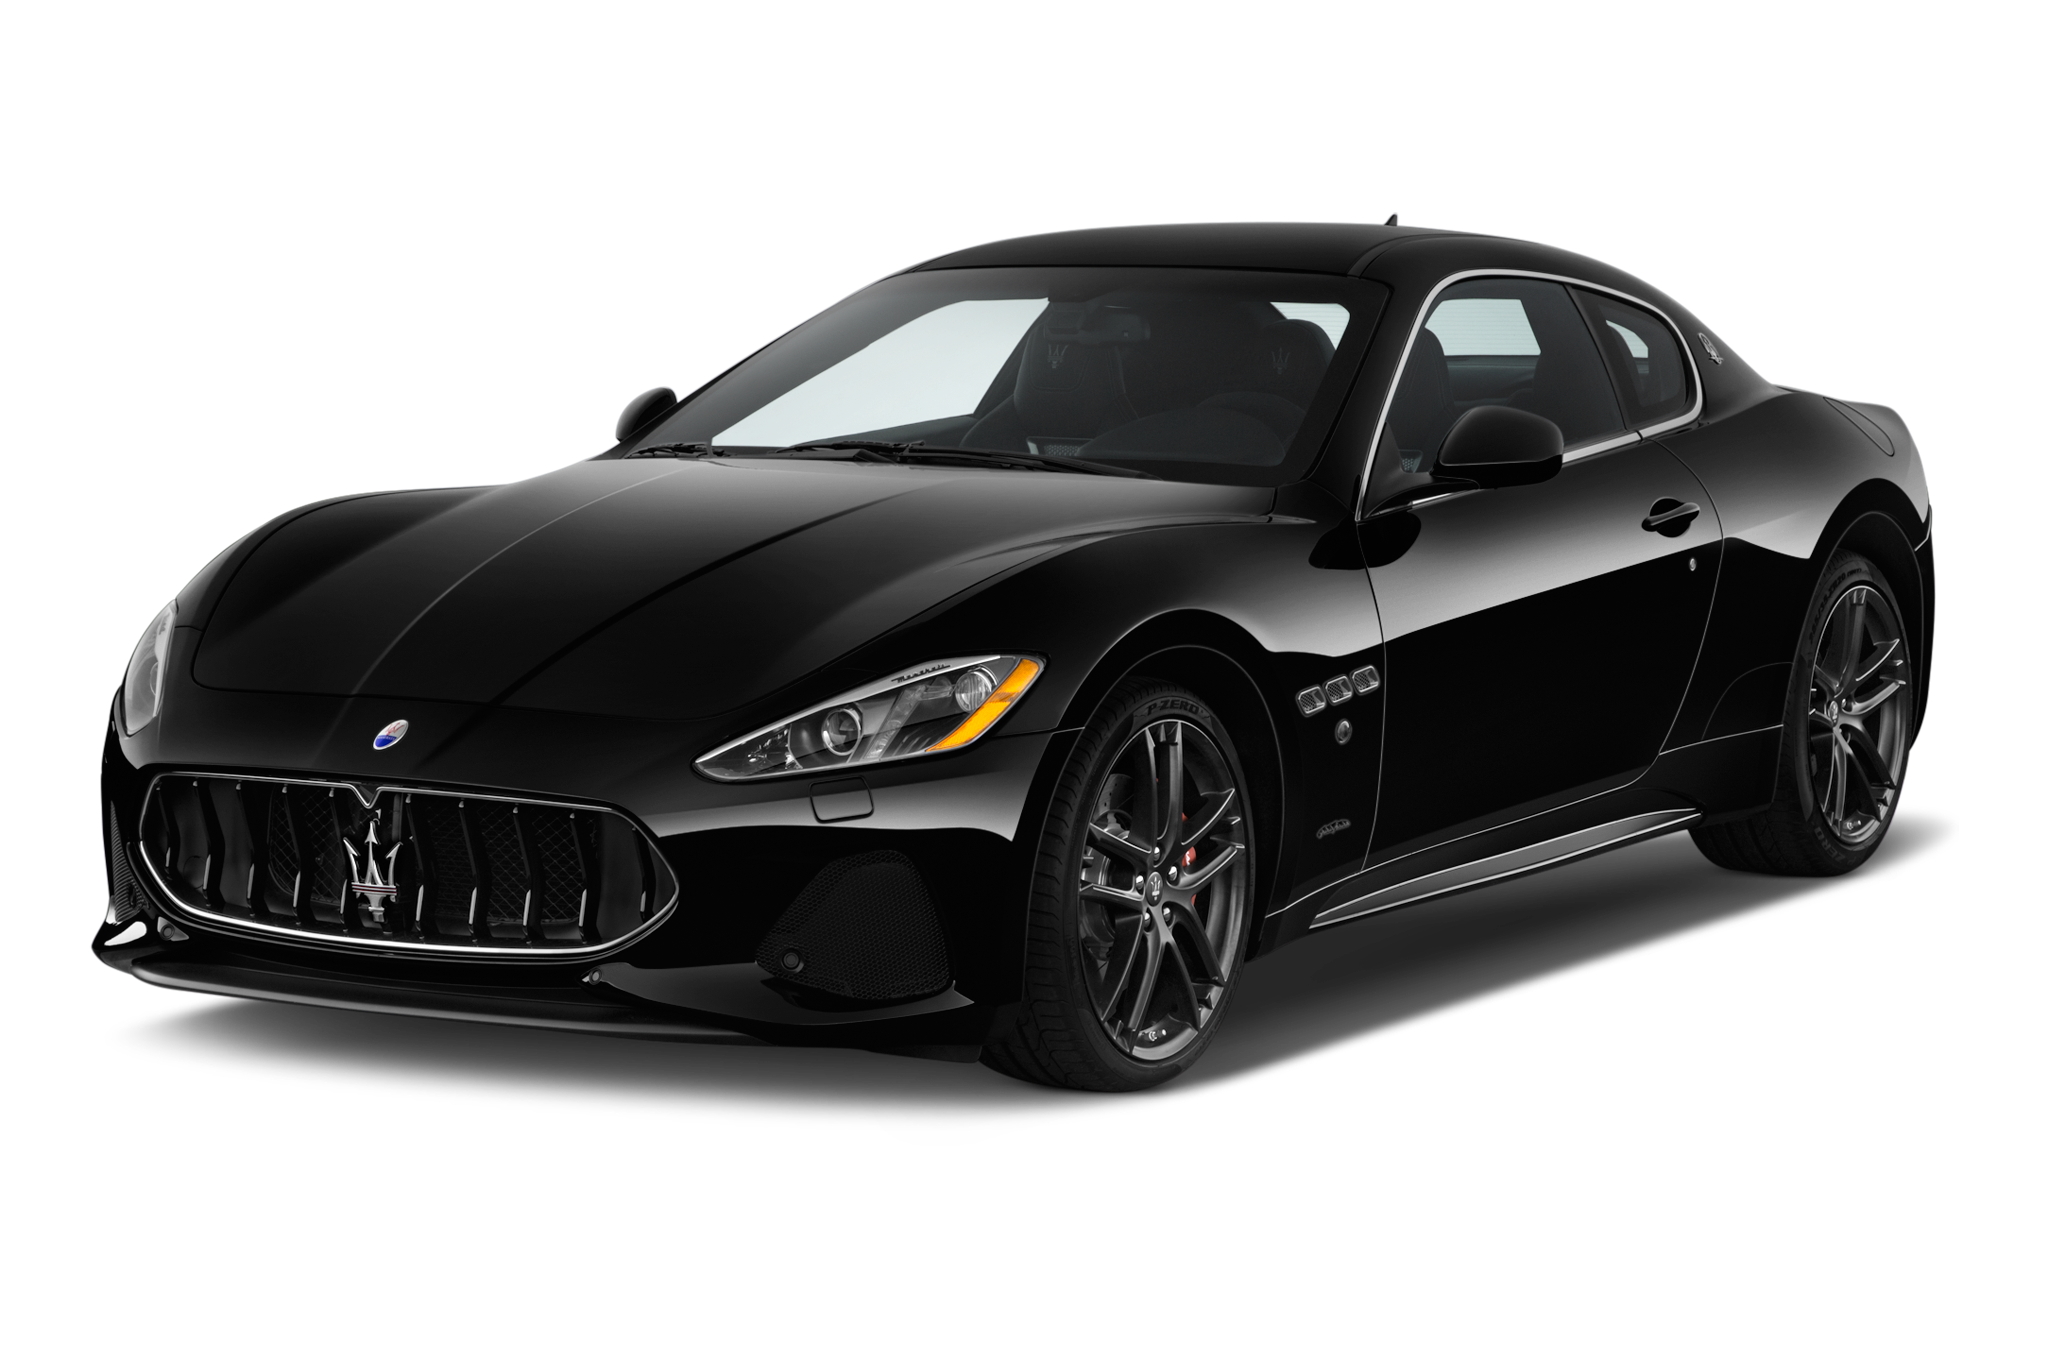 https://st.motortrendenespanol.com/uploads/sites/10/2018/02/2018-maserati-granturismo-sport-coupe-angular-front.png